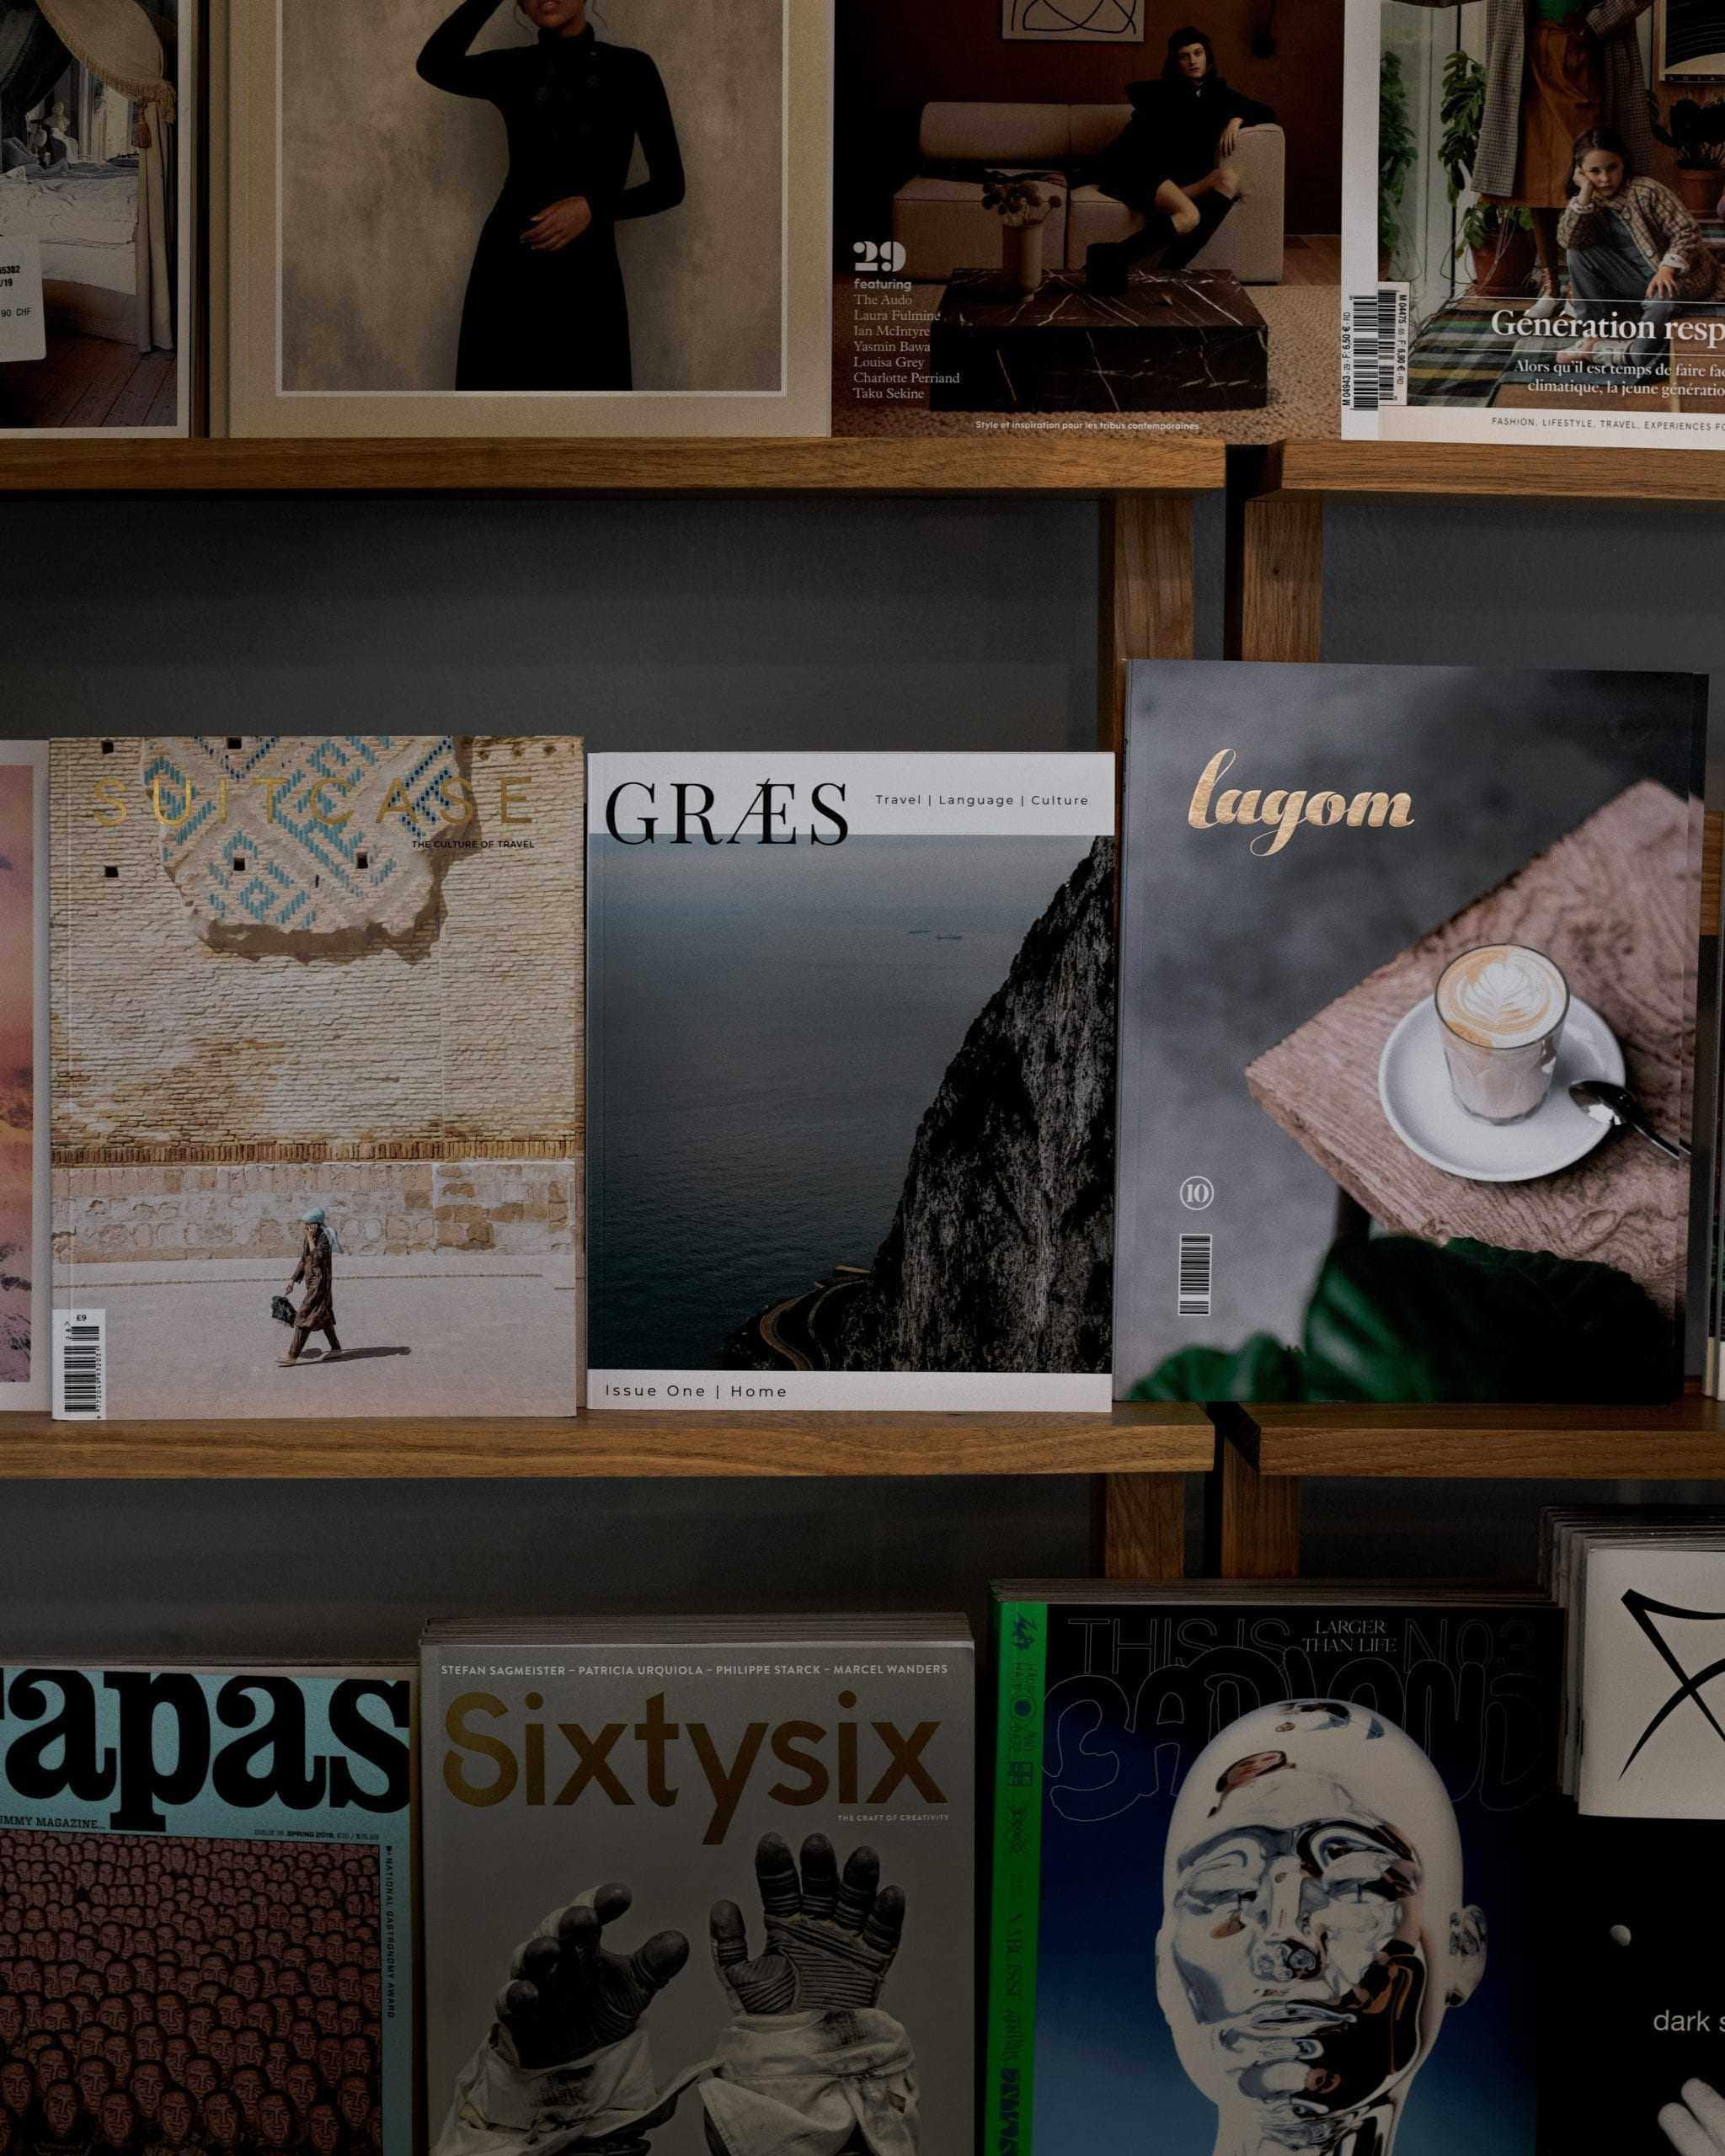 graes magazine Saf4i9kL8Zs unsplash scaled